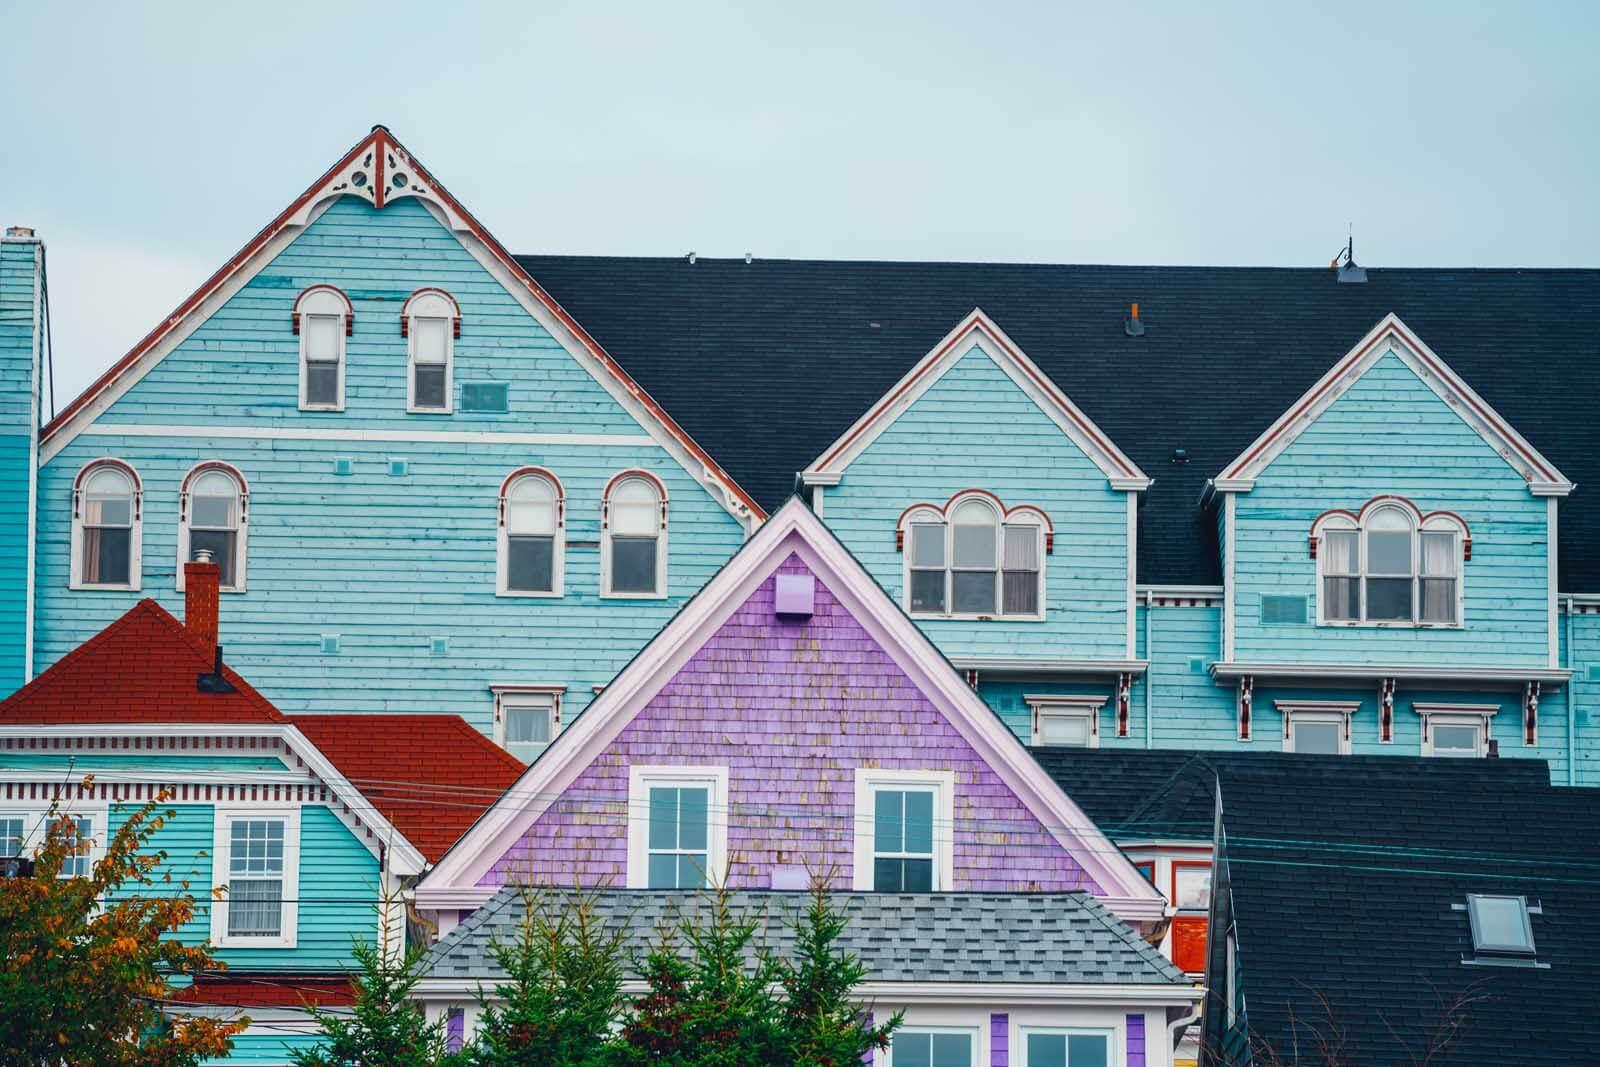 colorful buildings in Lunenburg Nova Scotia